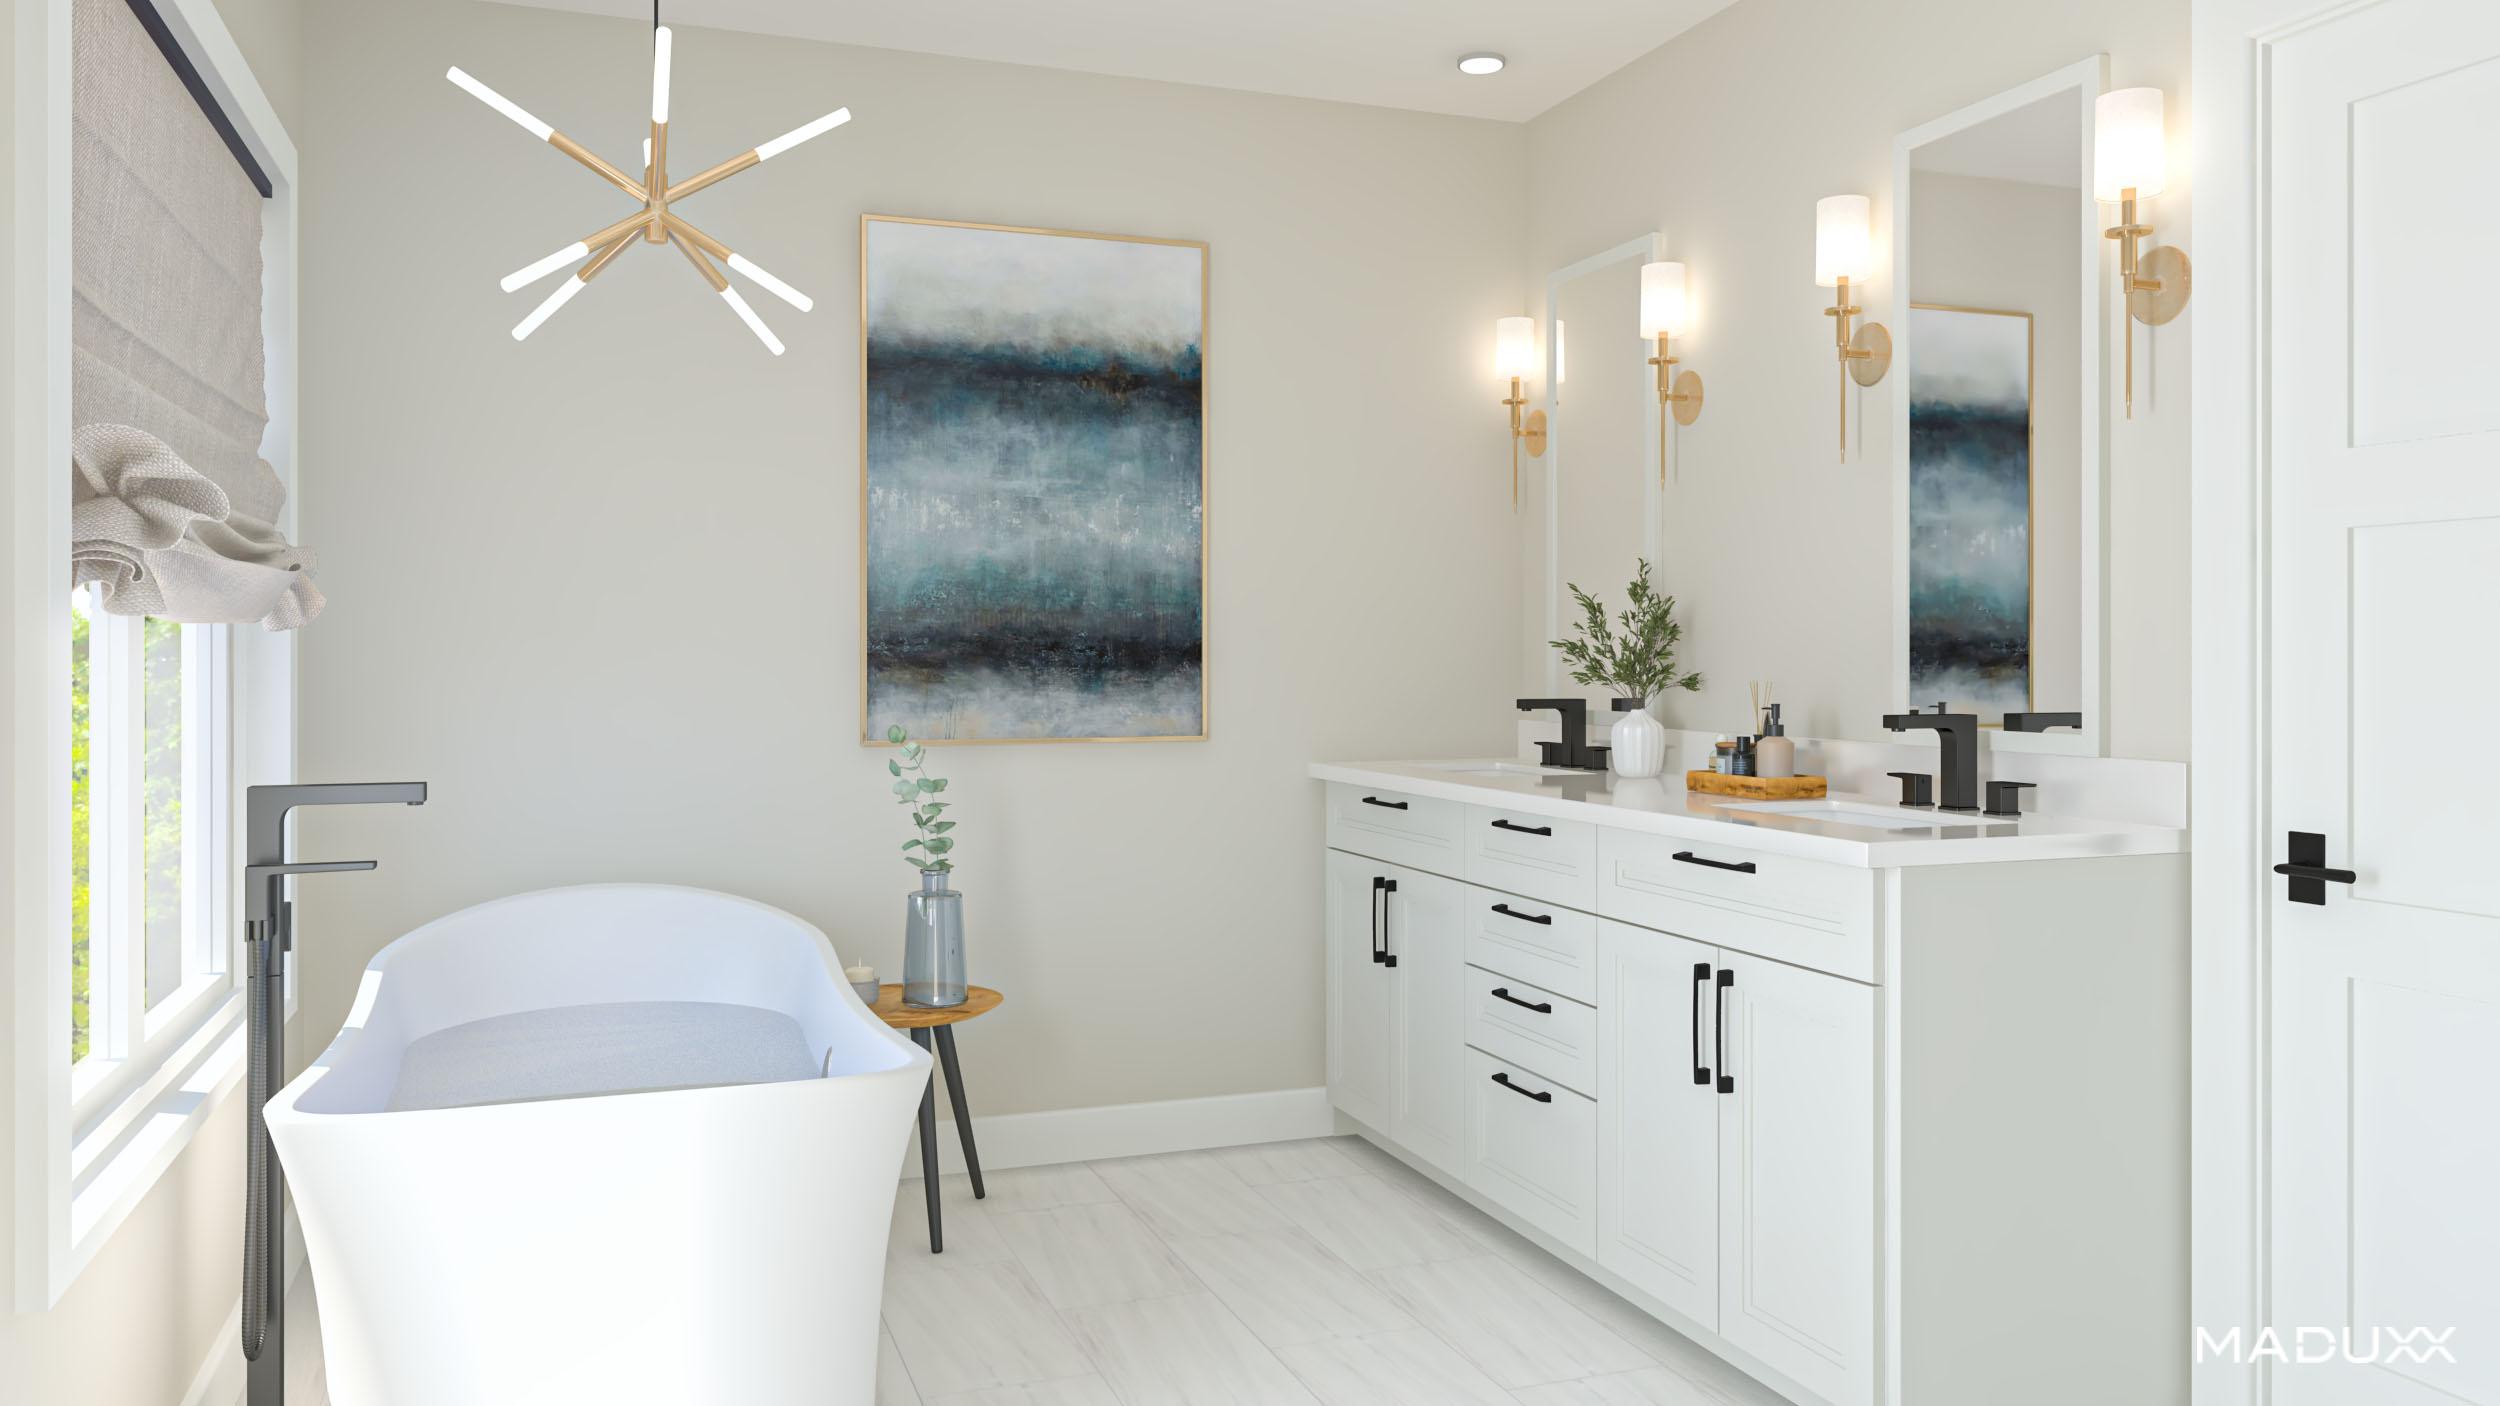 Bathroom featured at The Matheson Oakville by Alex Irish & Associates